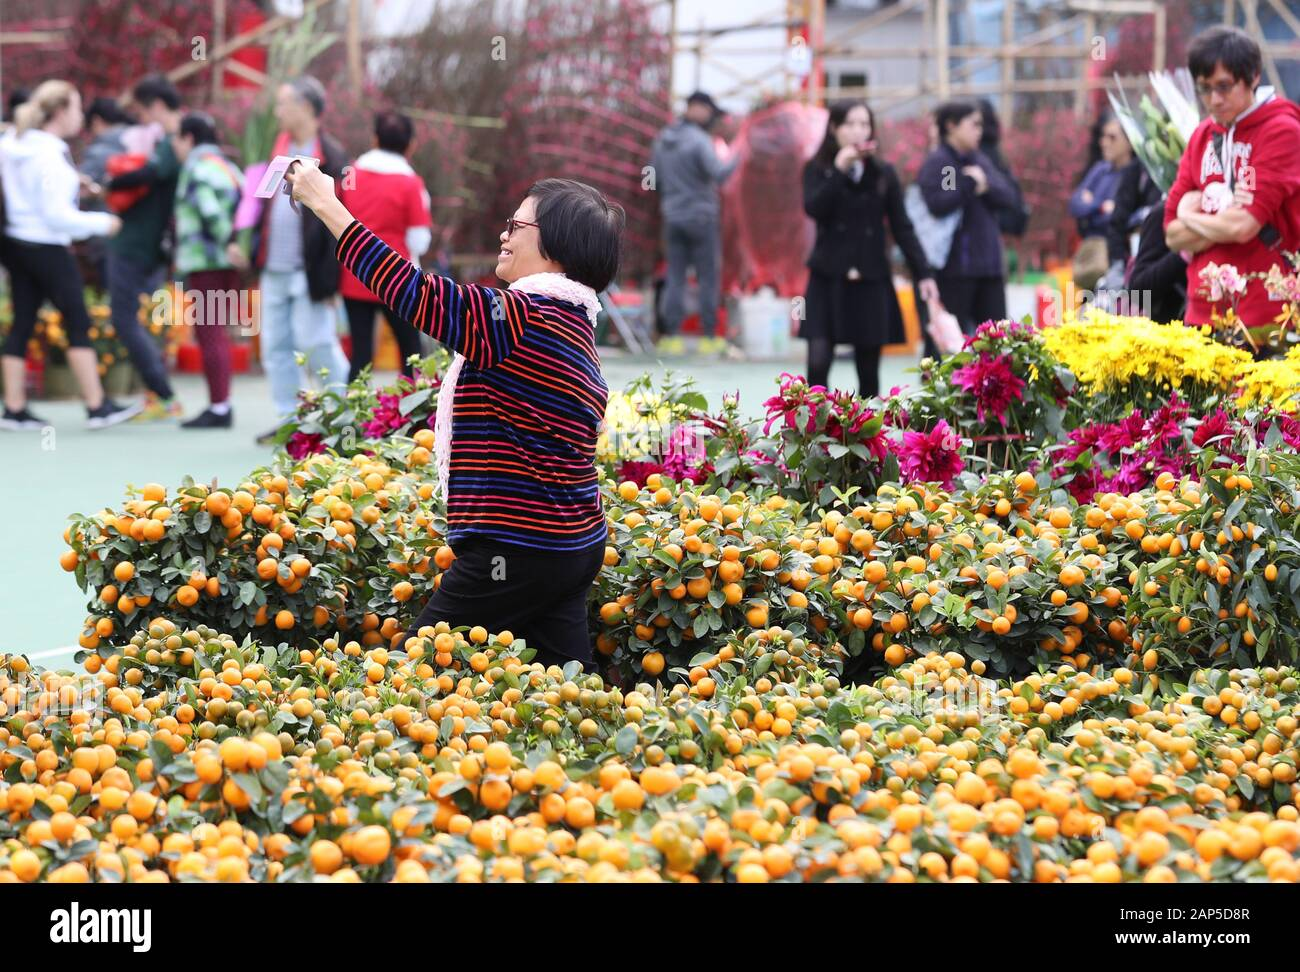 Hong Kong, China. 21st Jan, 2020. A customer poses for a selfie at a flower market to greet the Spring Festival at the Victoria Park in Hong Kong, south China, Jan. 21, 2020. Credit: Li Gang/Xinhua/Alamy Live News Stock Photo